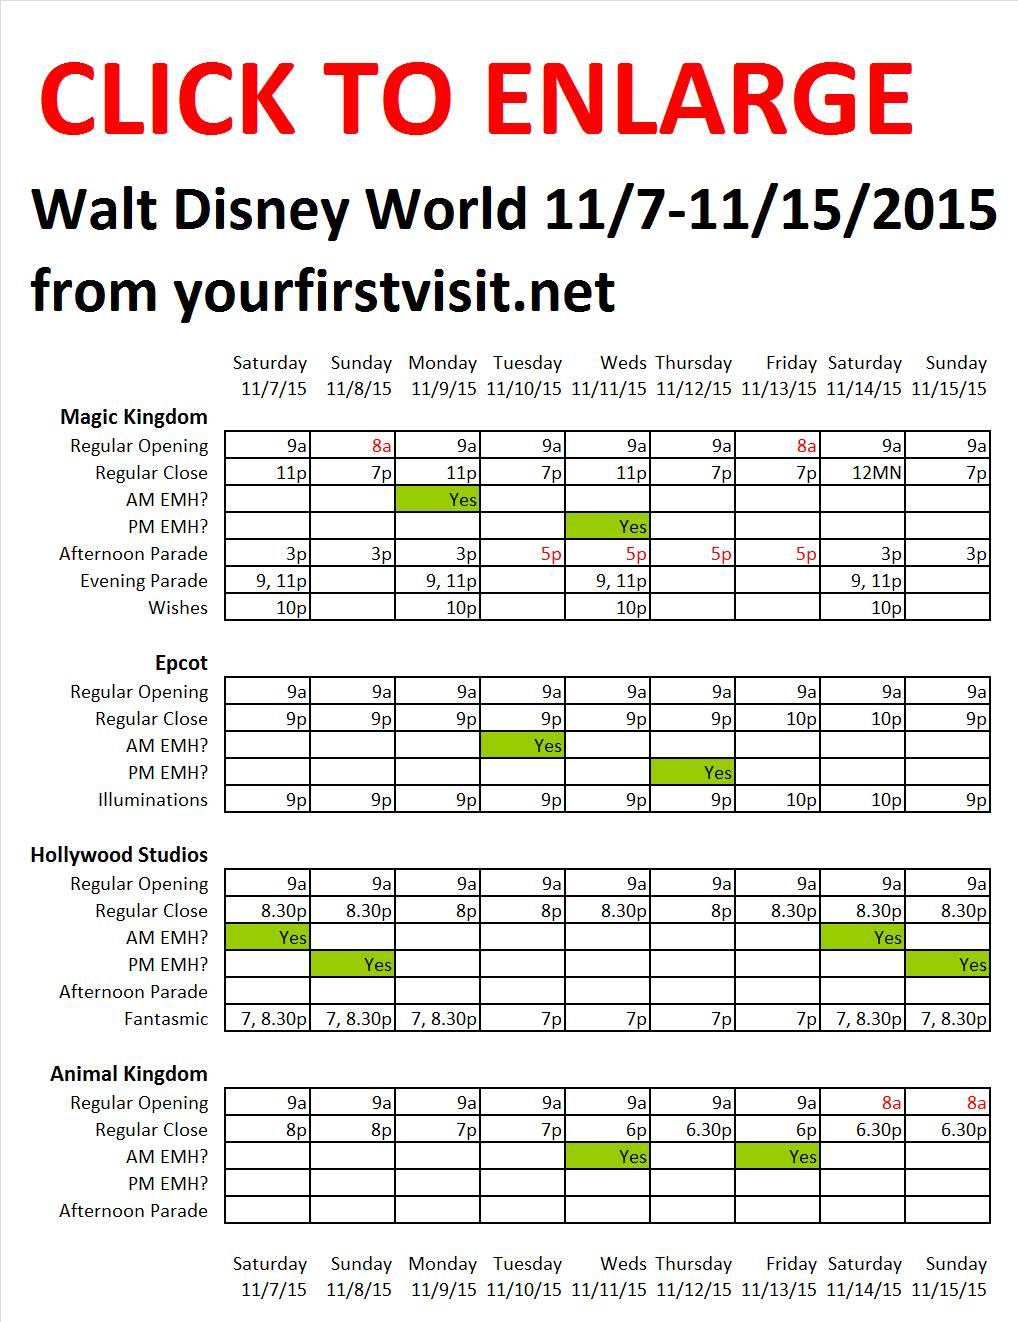 Disney World 11-7 to 11-15-2015 from yourfirstvisit.net